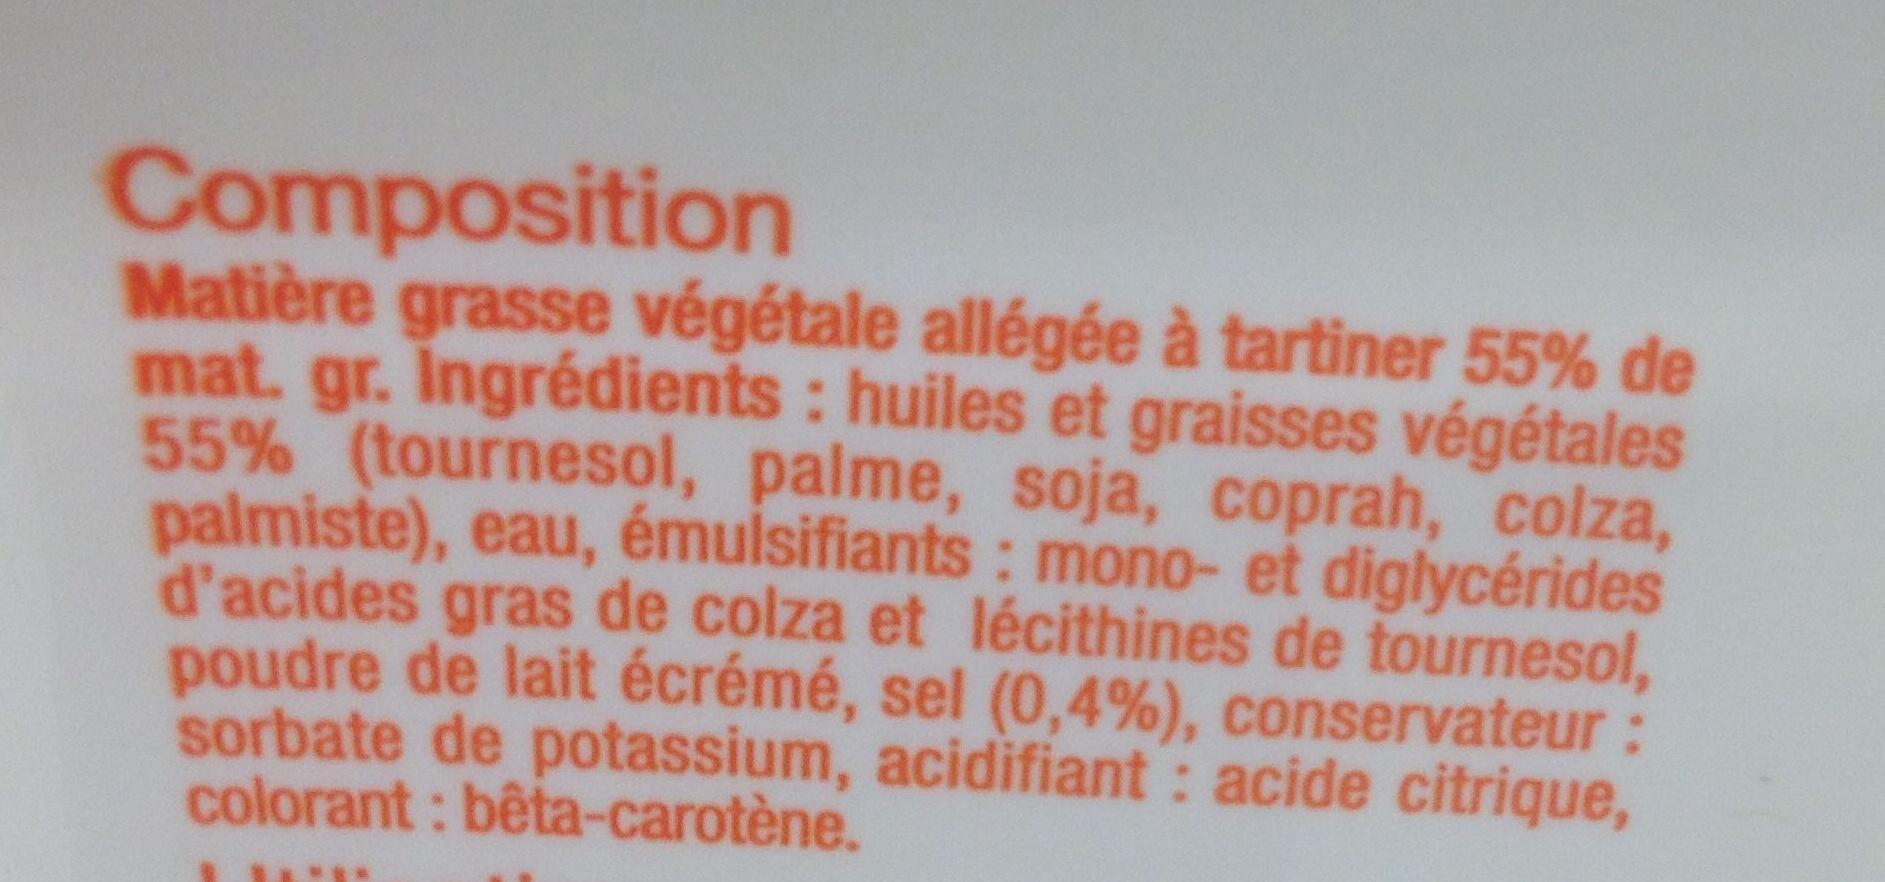 Matière grasse végétale - Ingredienti - fr